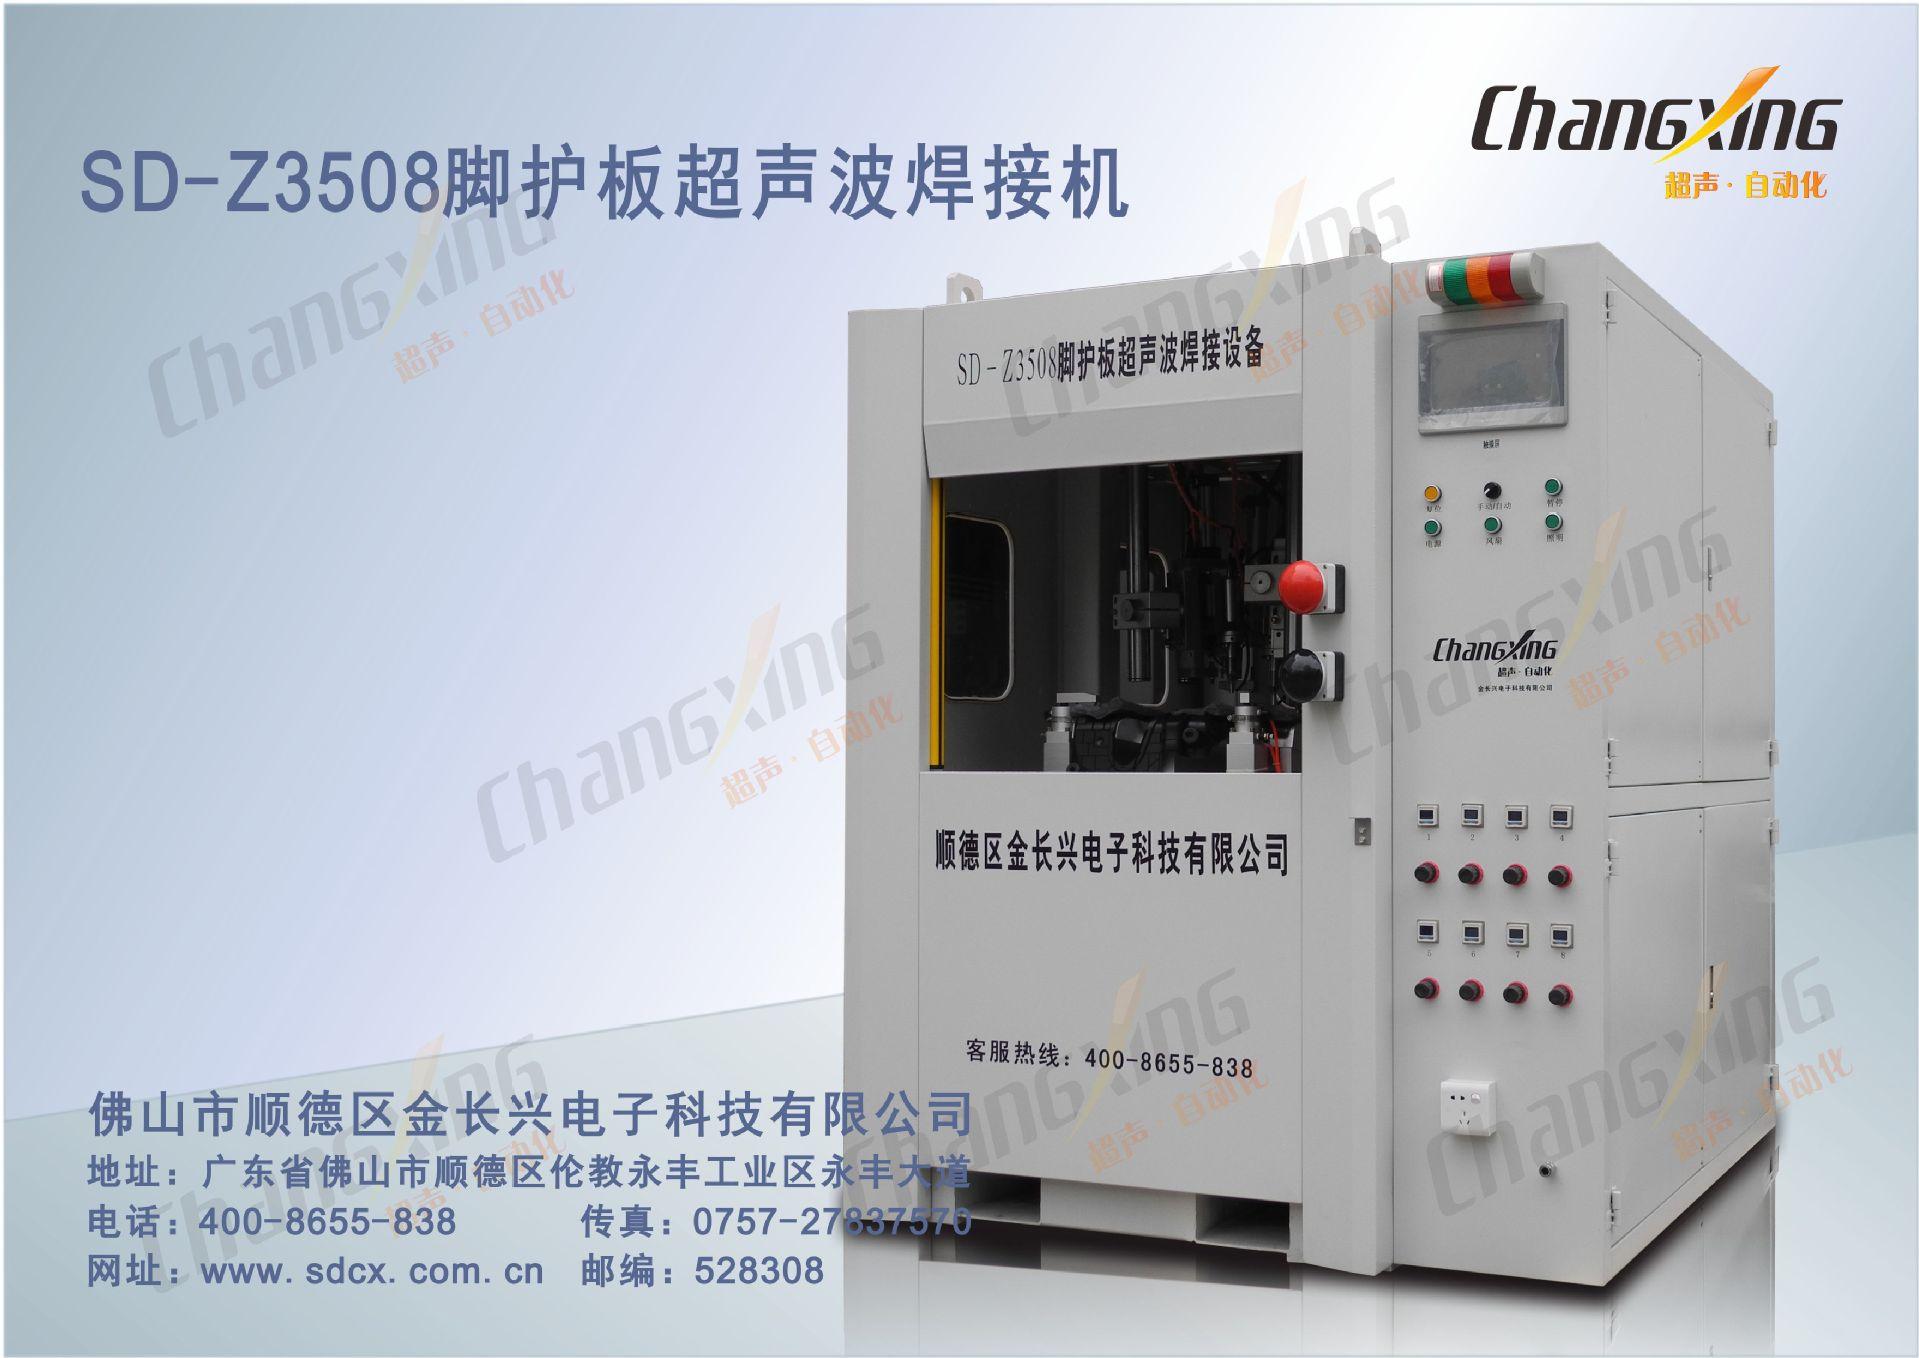 SD-Z3508脚护板超声波焊接机(1)